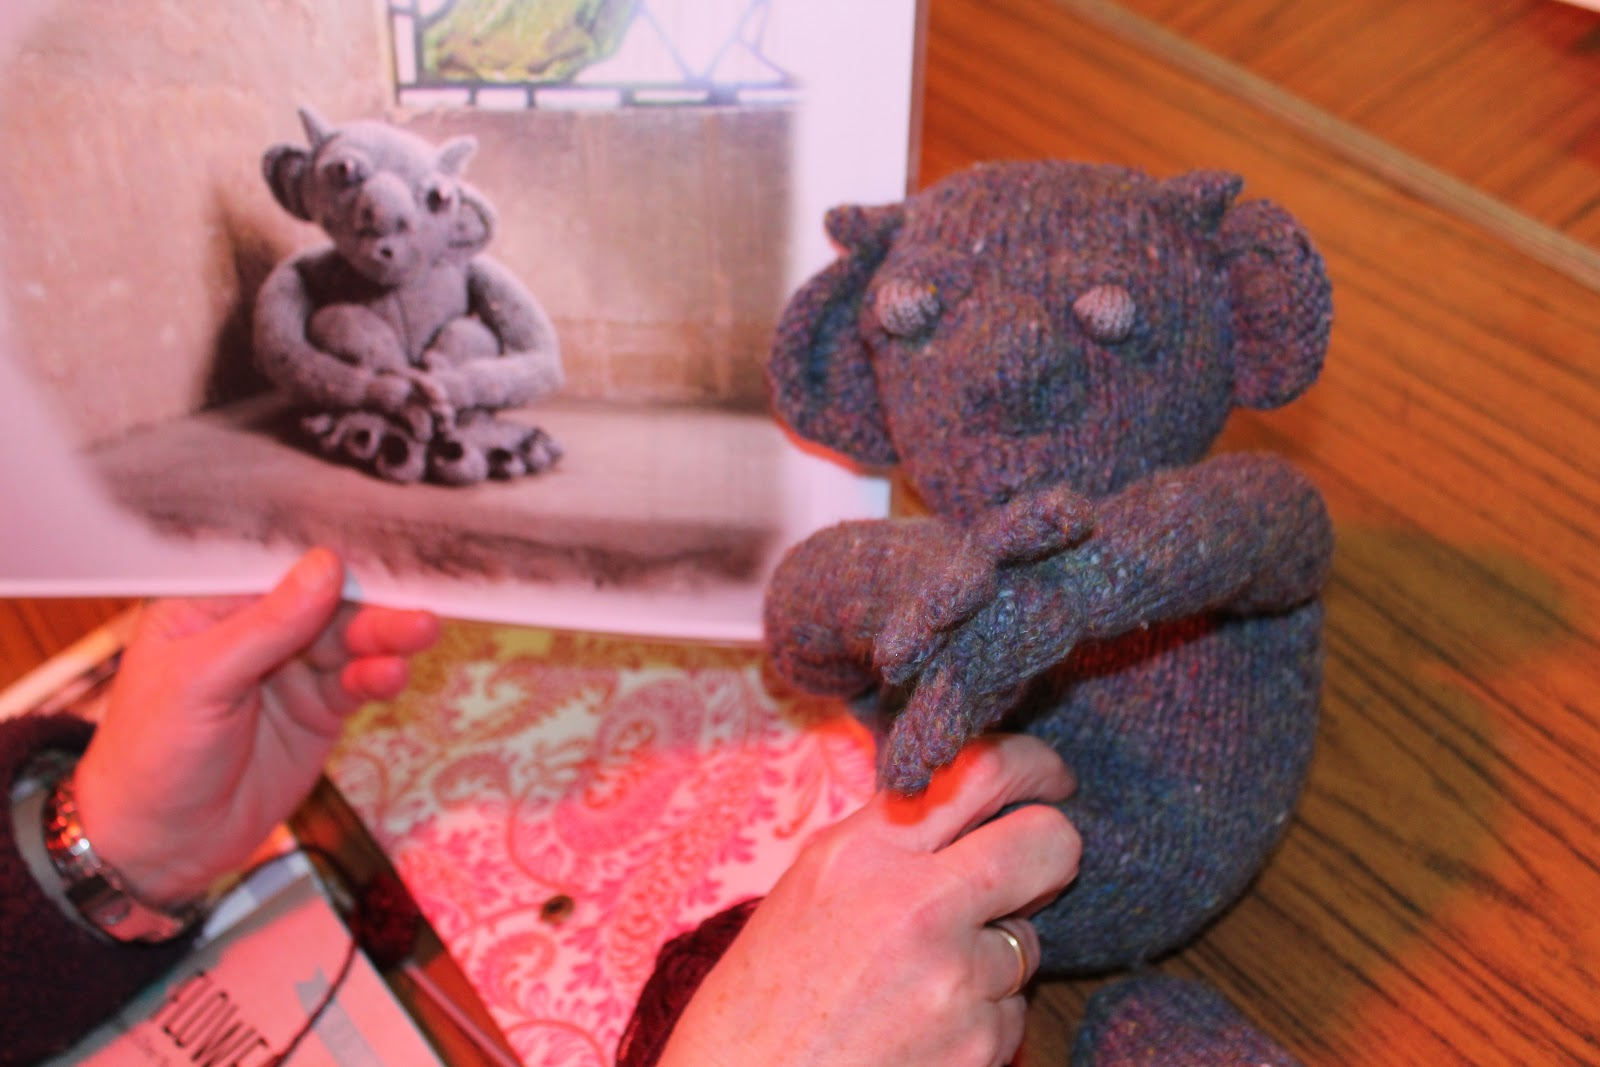 Knit Natter And Stitch New Bradwell : Knit, Natter & Stitch : Reported UFO sighting in Milton Keynes.